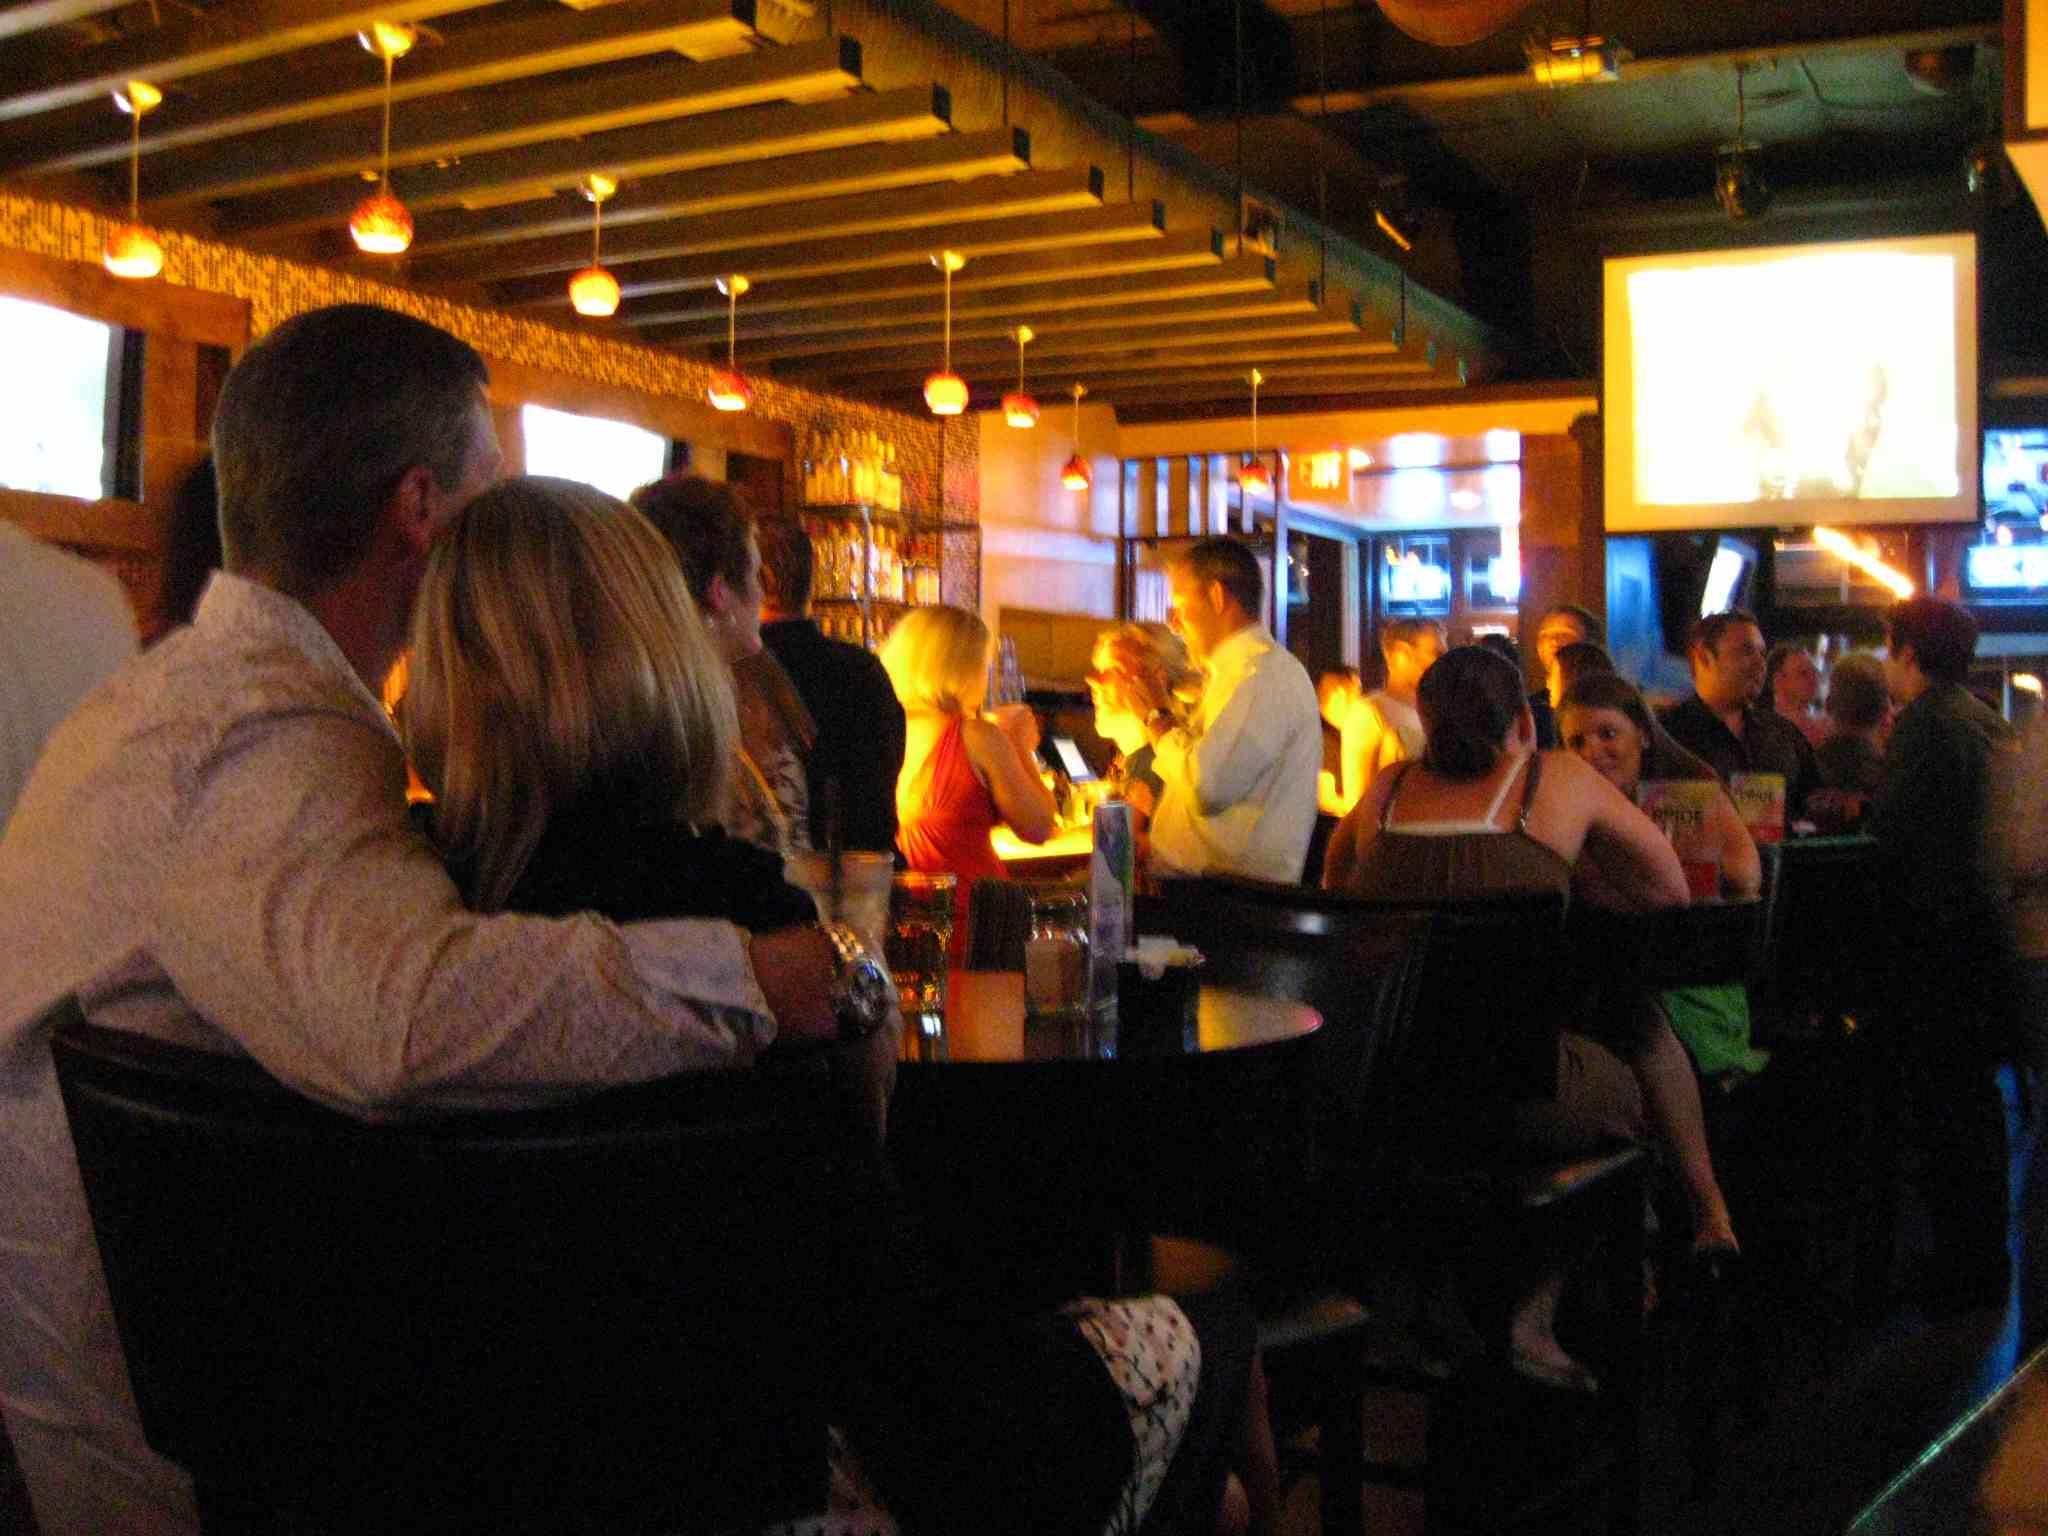 The Big Bar Grill